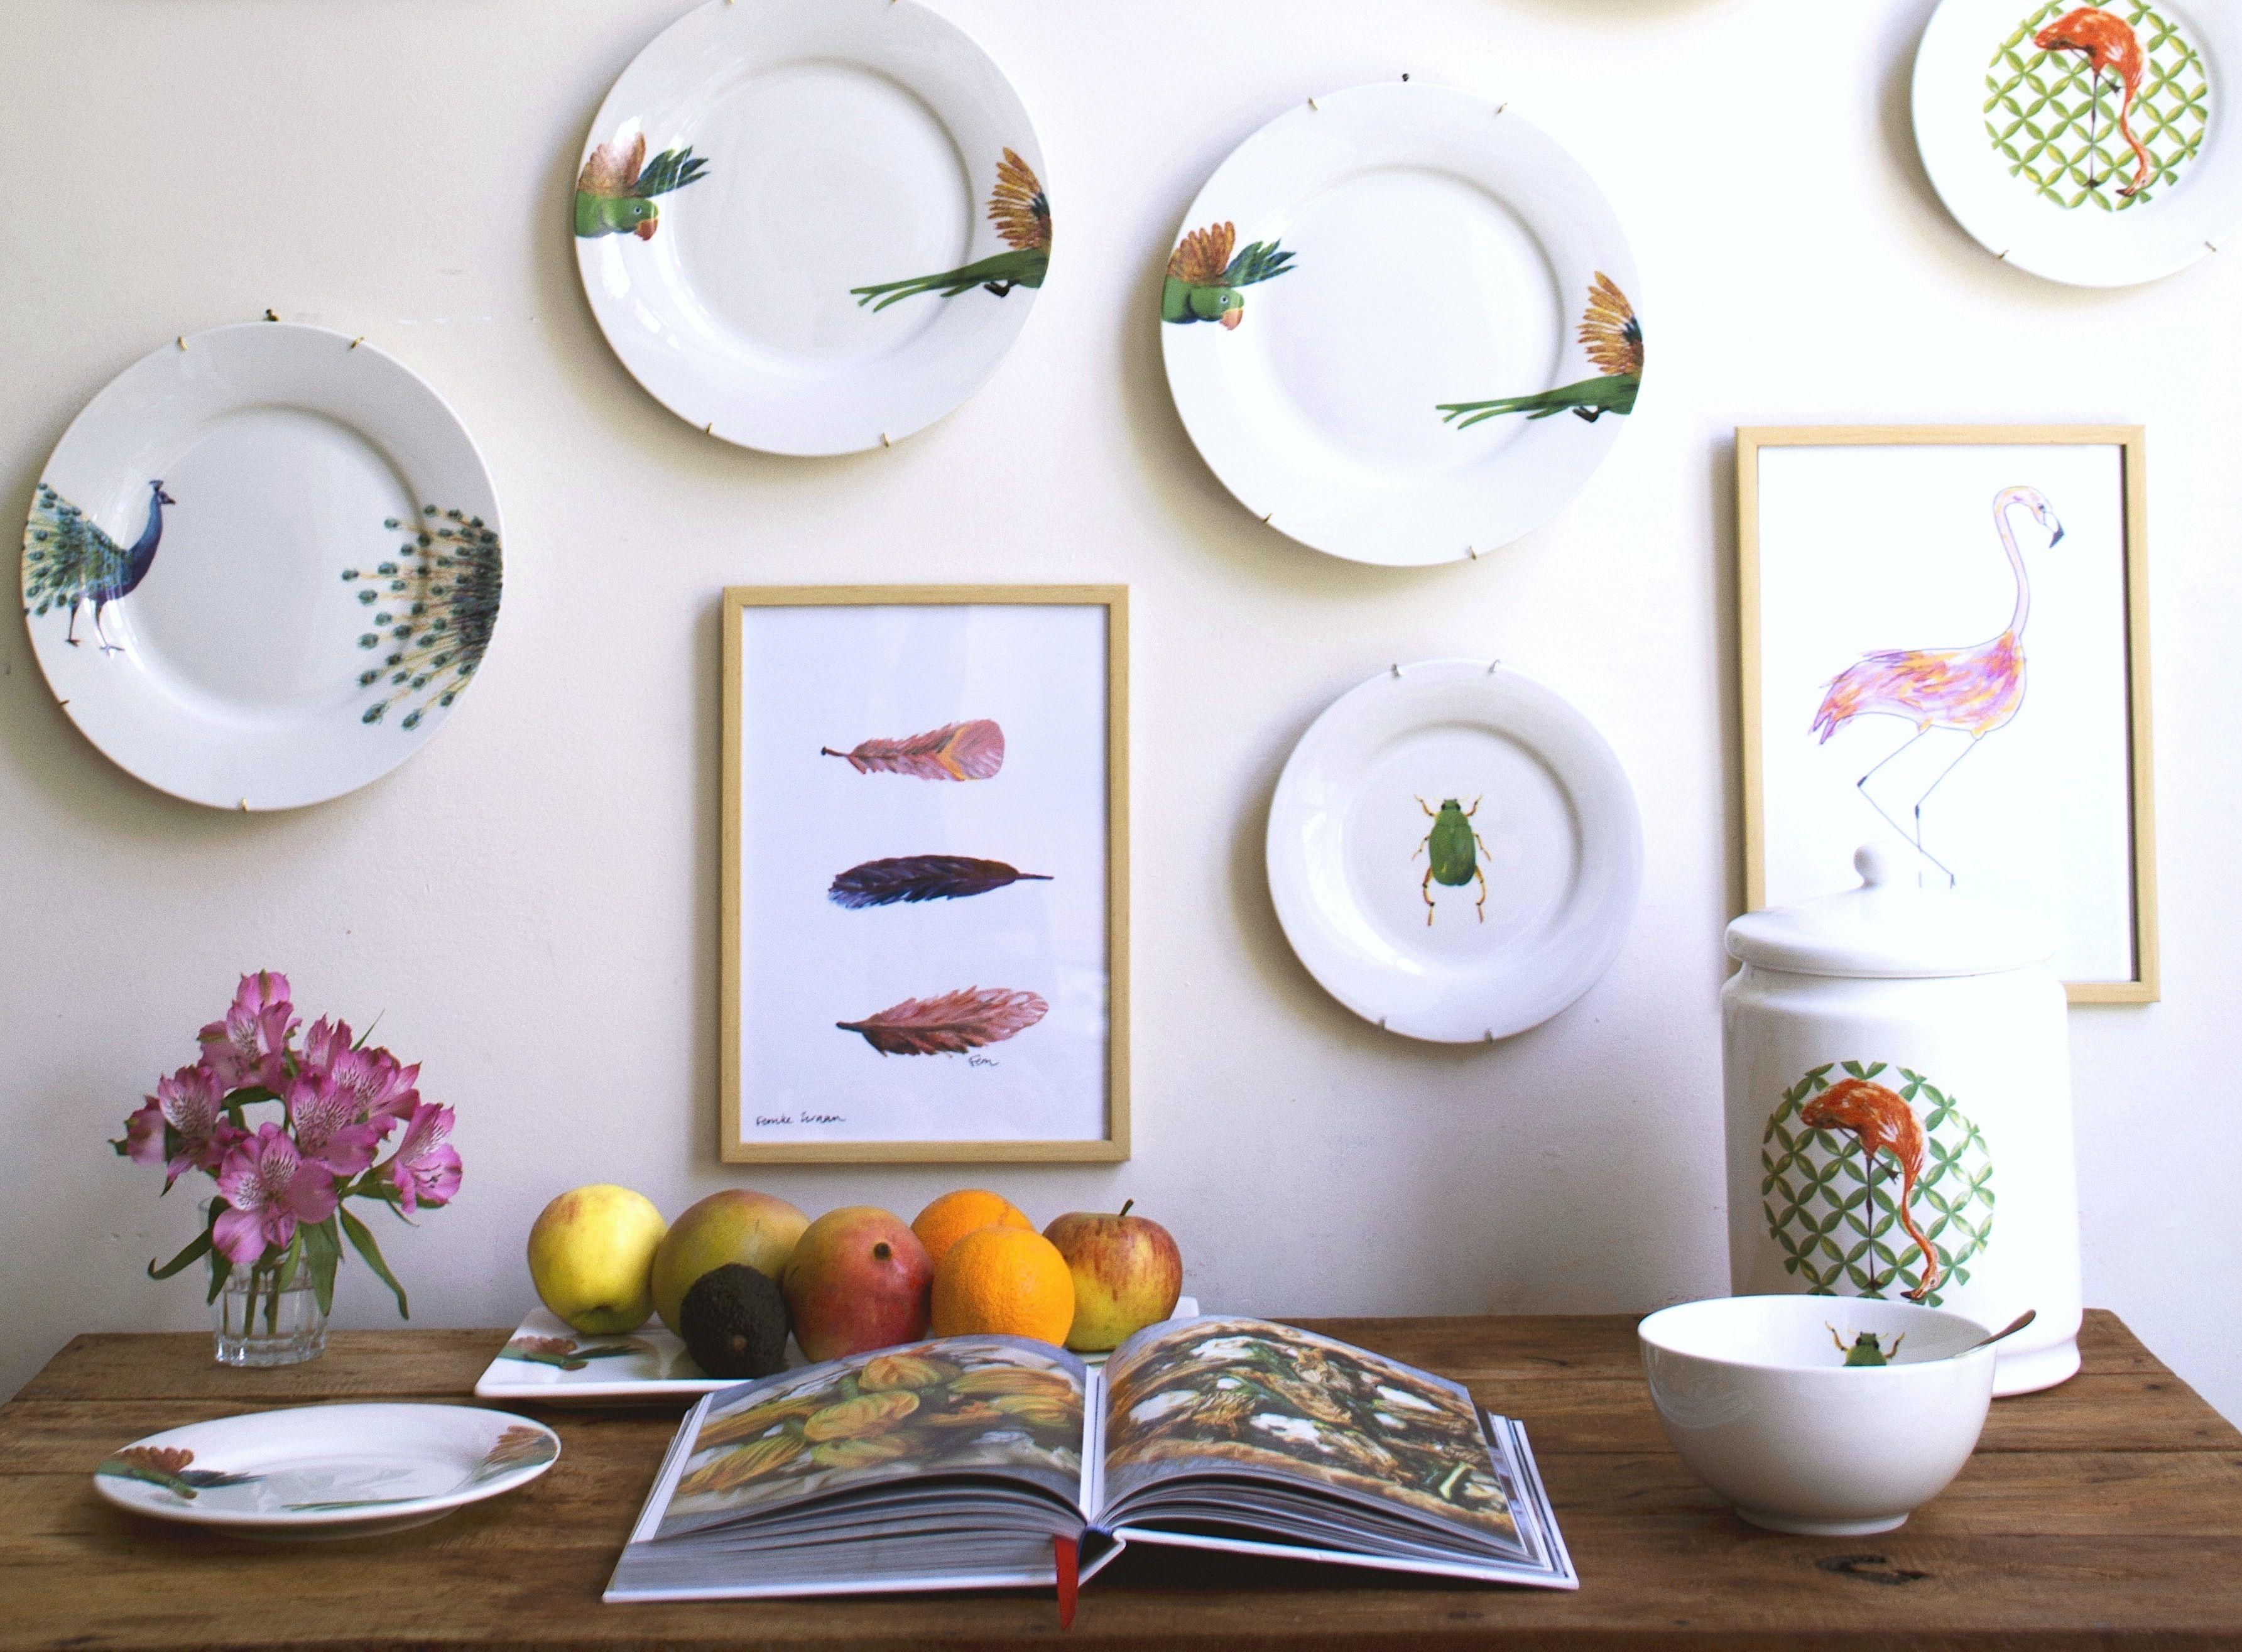 Catchii inspiration wall, beetle, lovebirds, flamingo, peacock, dinnerplates, illustrations, tableware